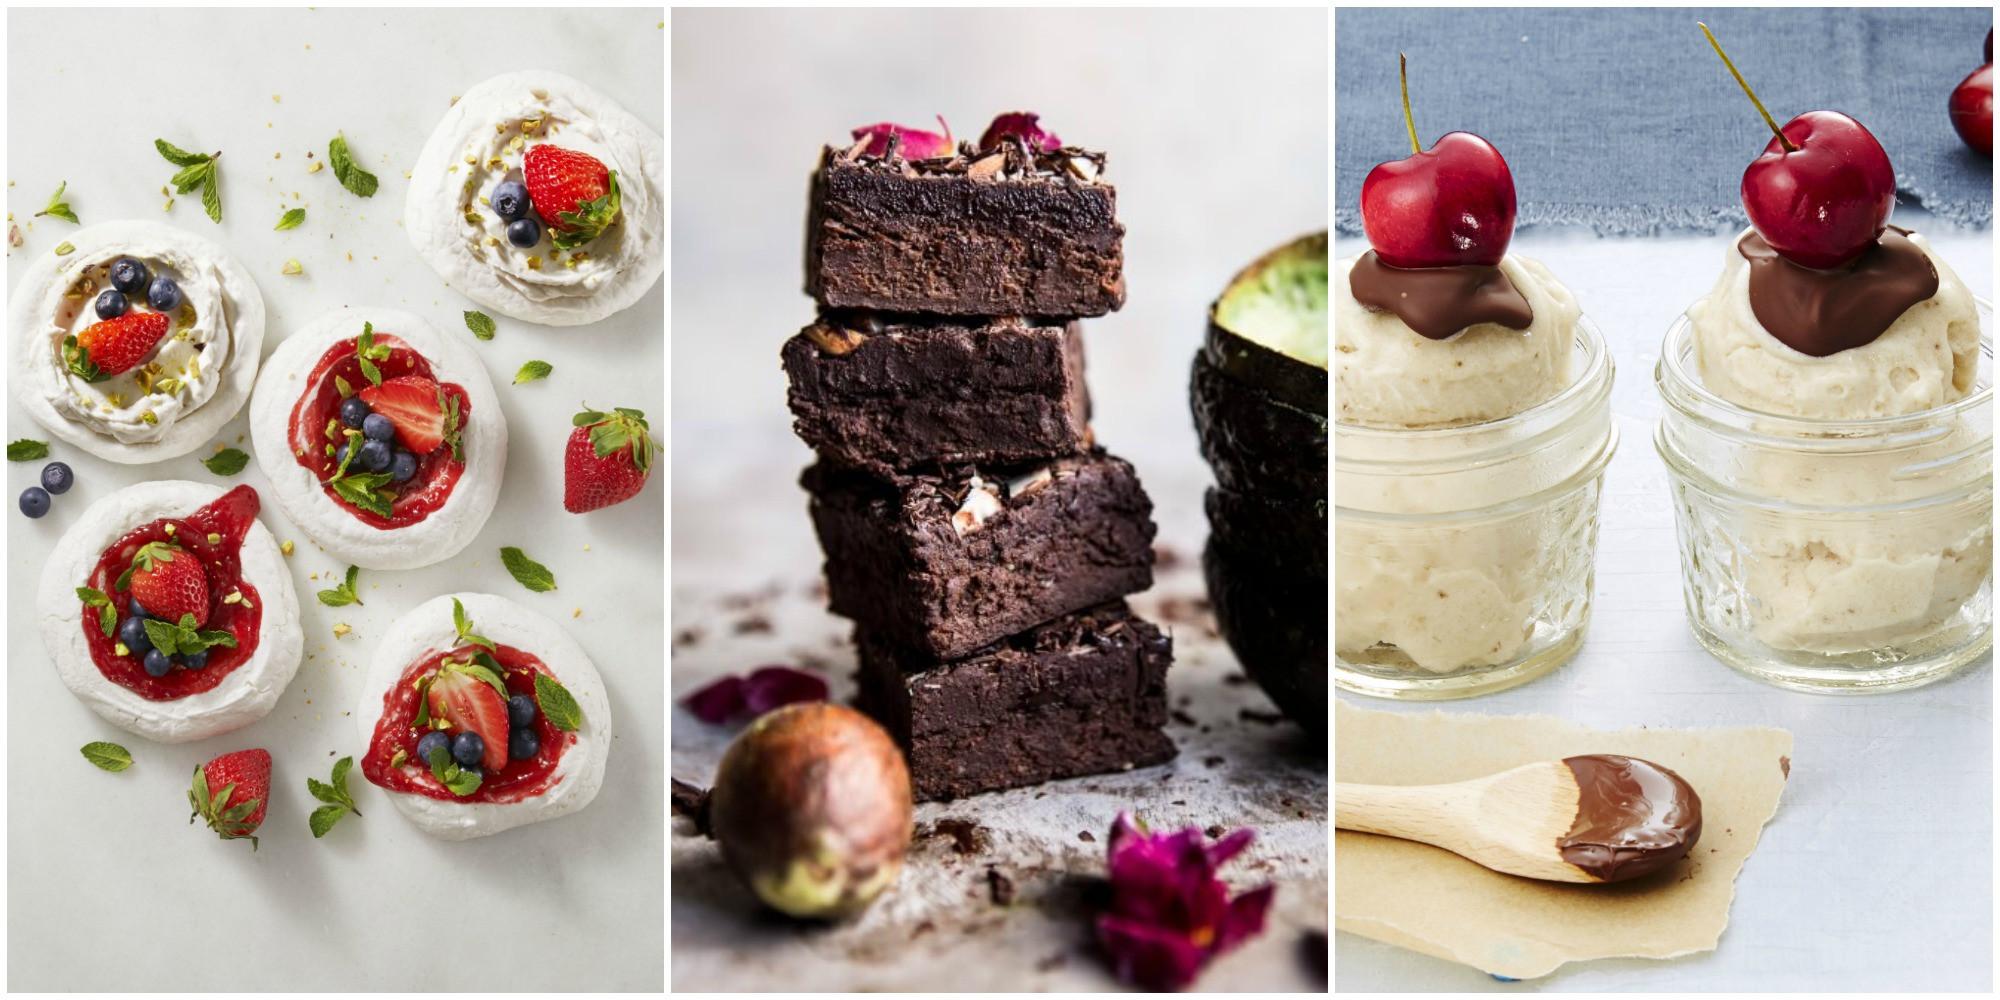 Easy Healthy Dessert Recipe  15 Best Healthy Dessert Recipes Easy Ideas for Low